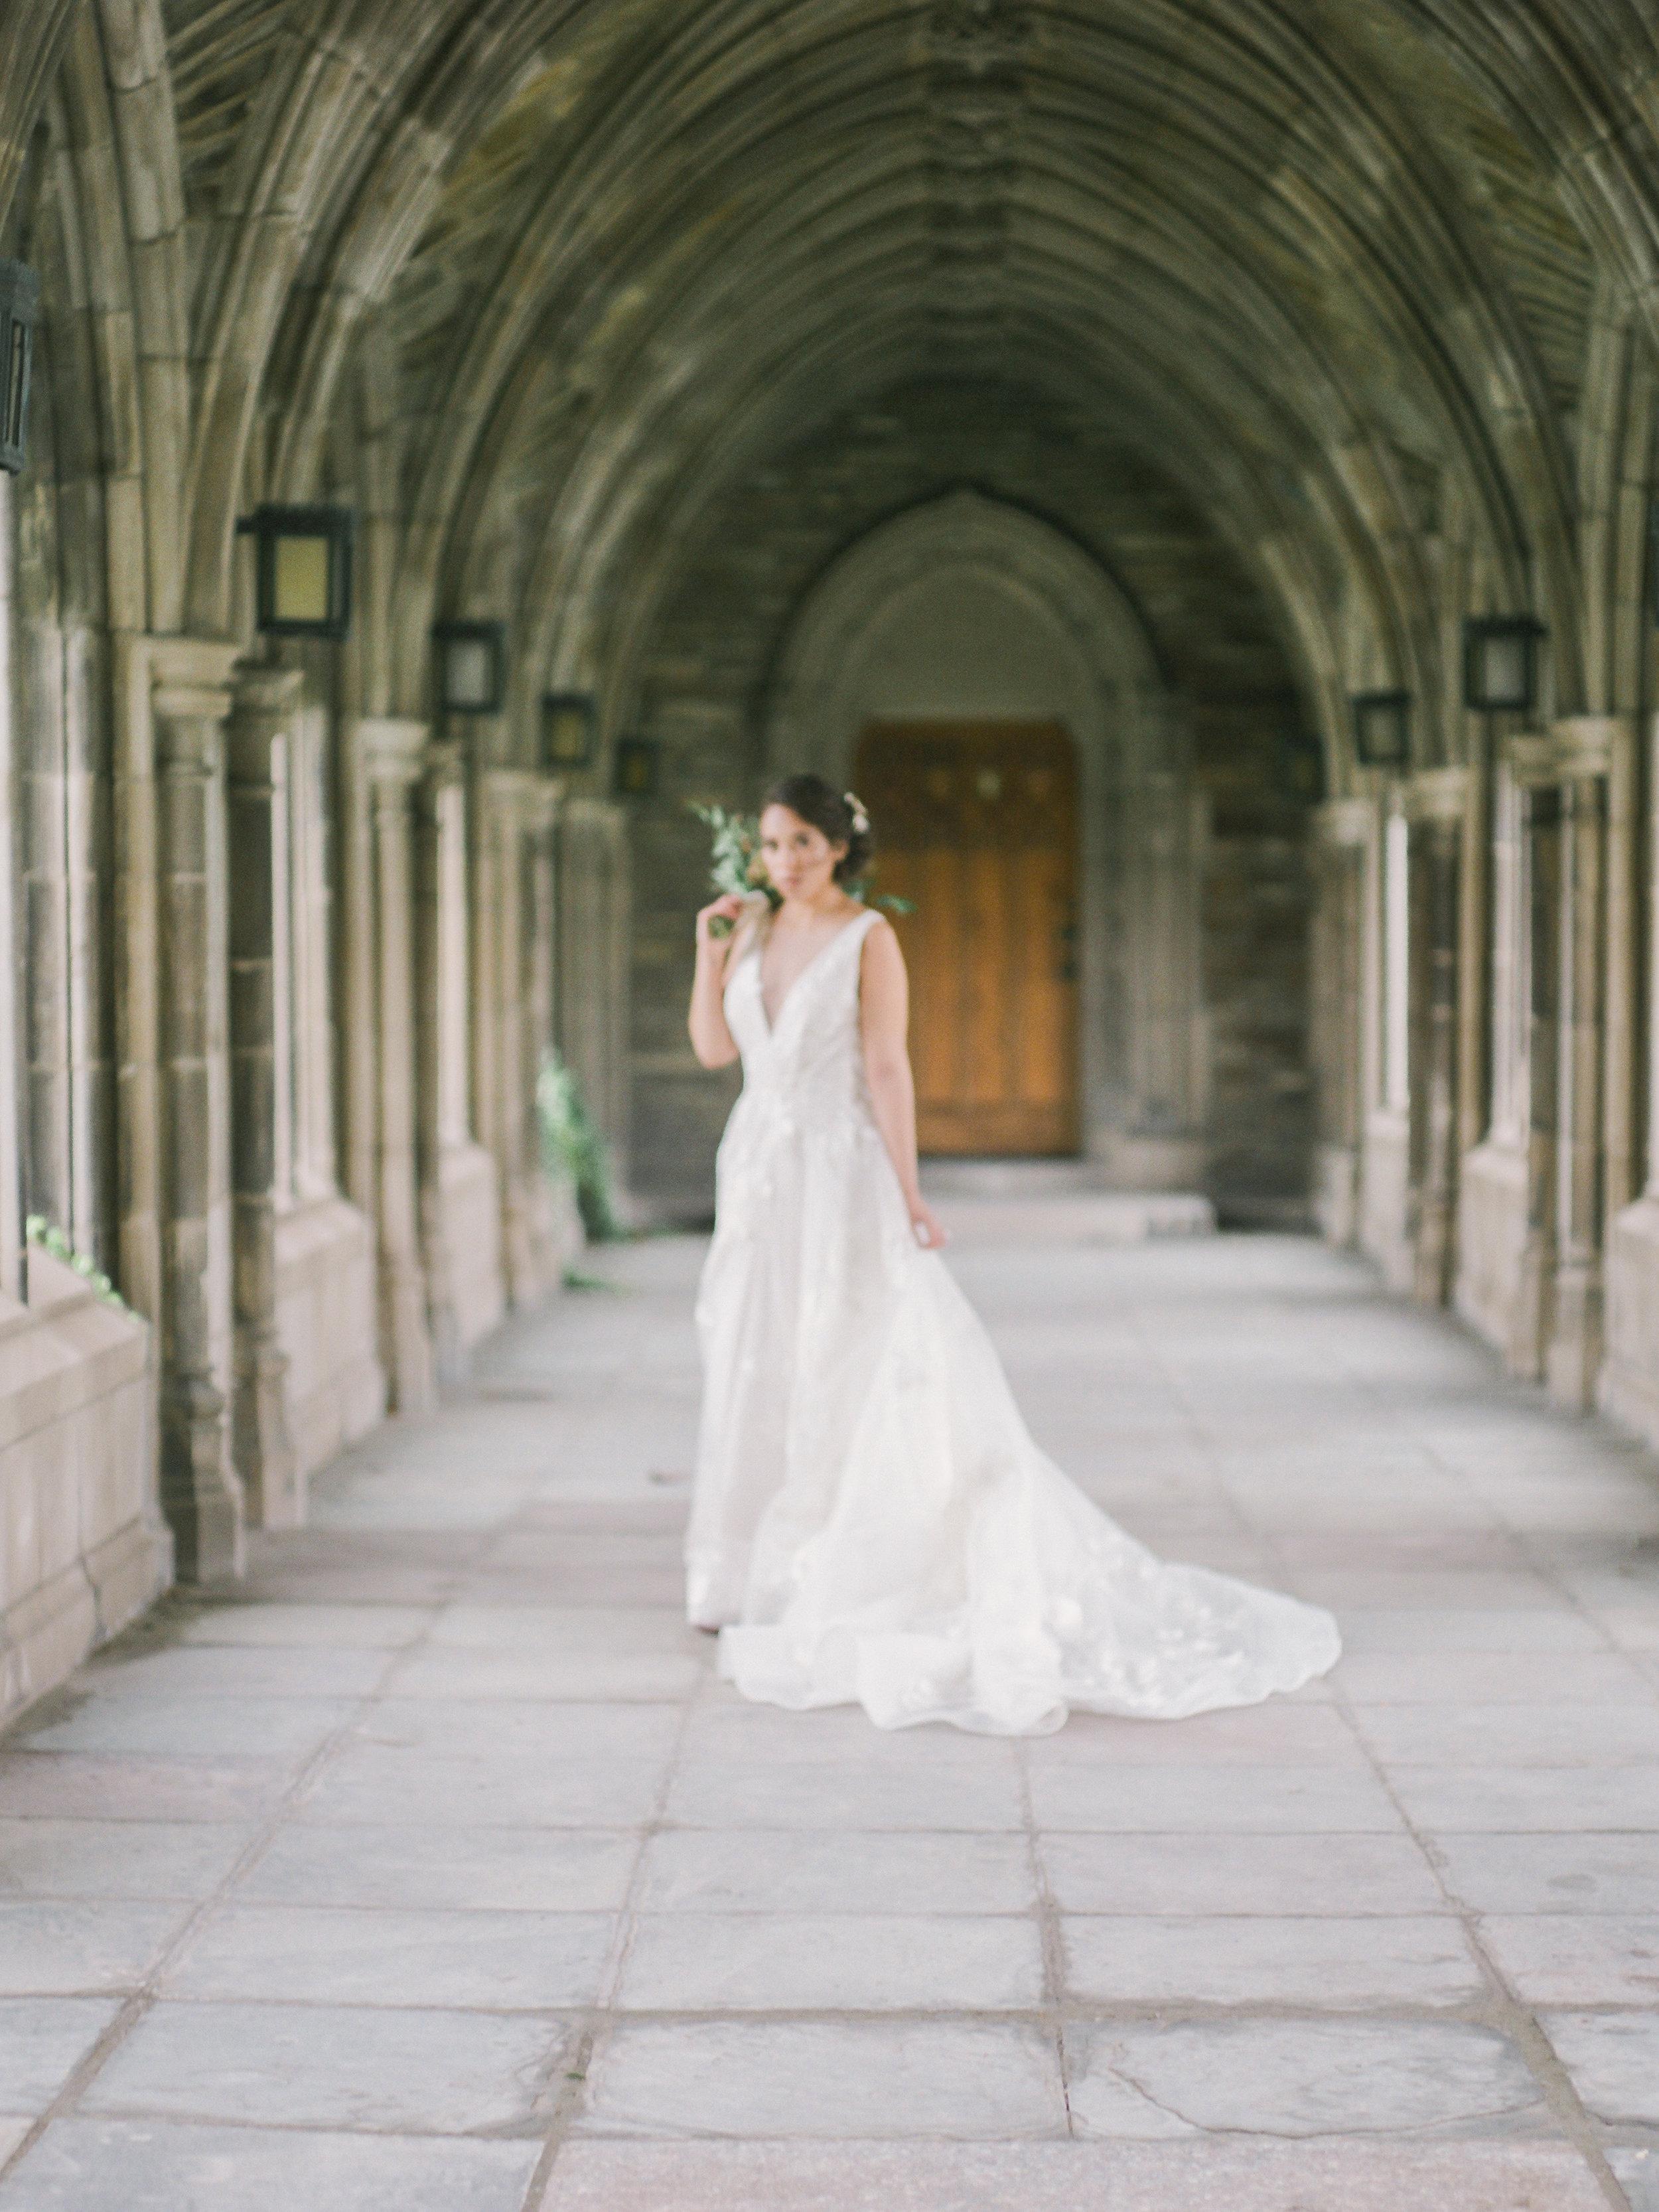 Ithaca New York-Brides Story-Manda Weaver-Wedding-57.jpg